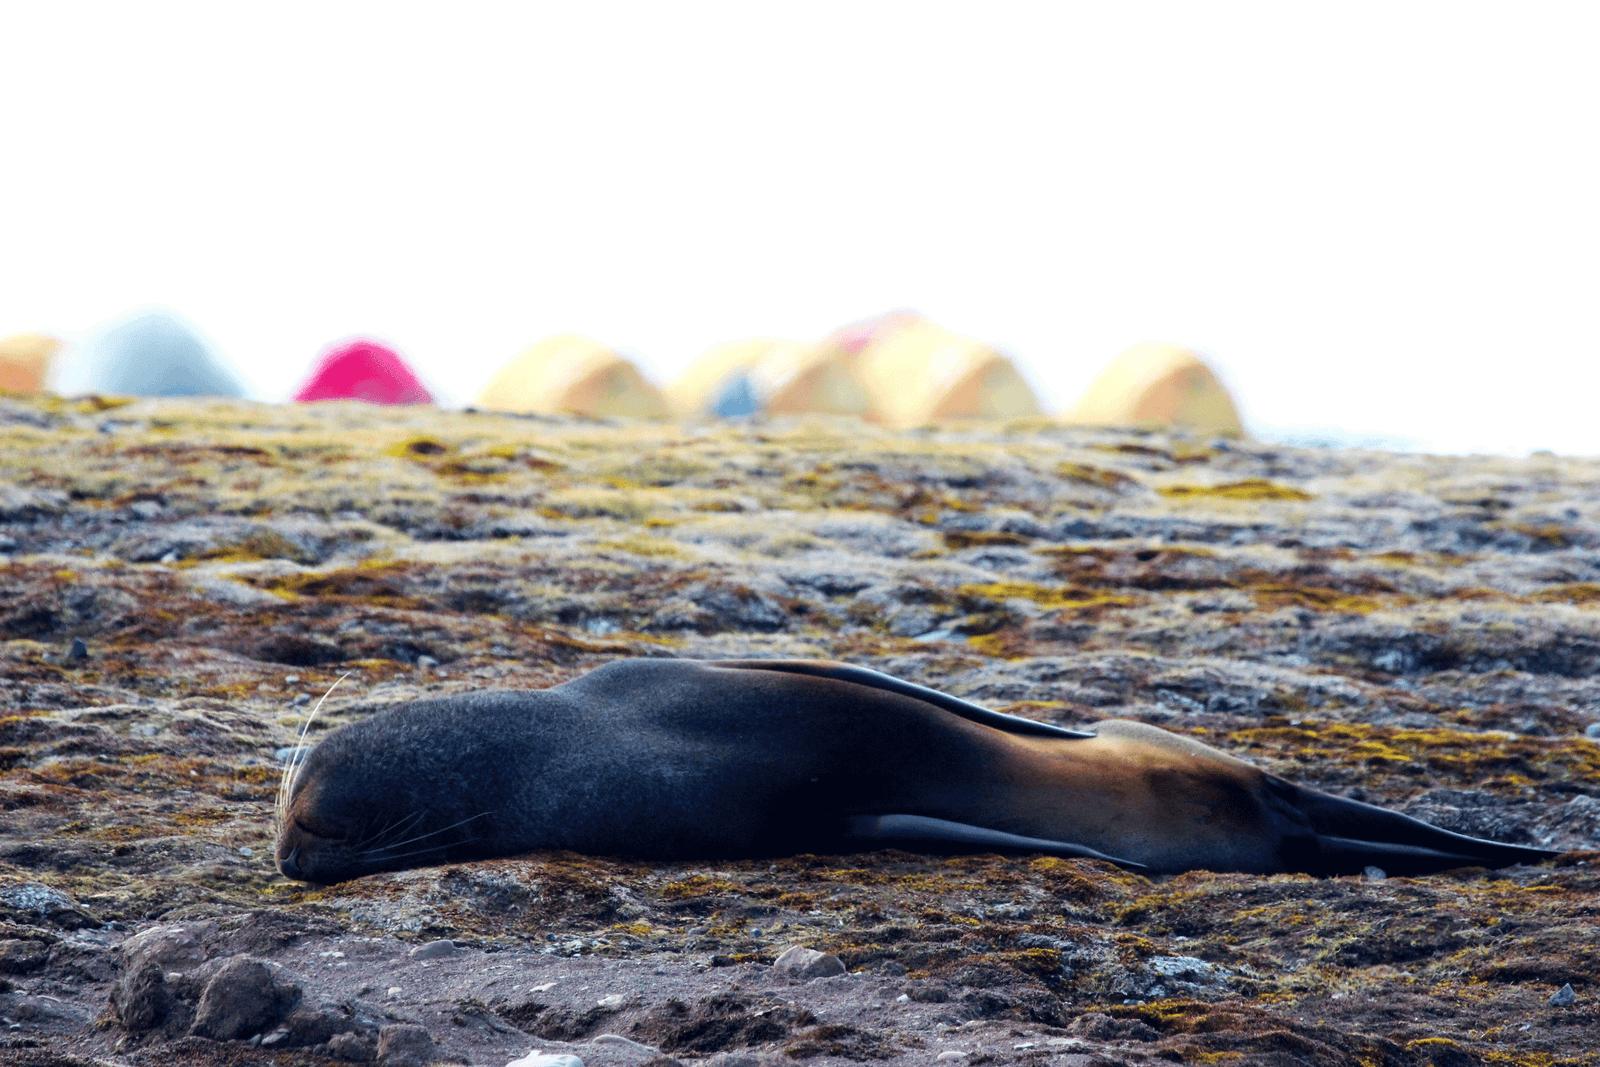 Fur seal asleep in front of Byers Peninsula campsite